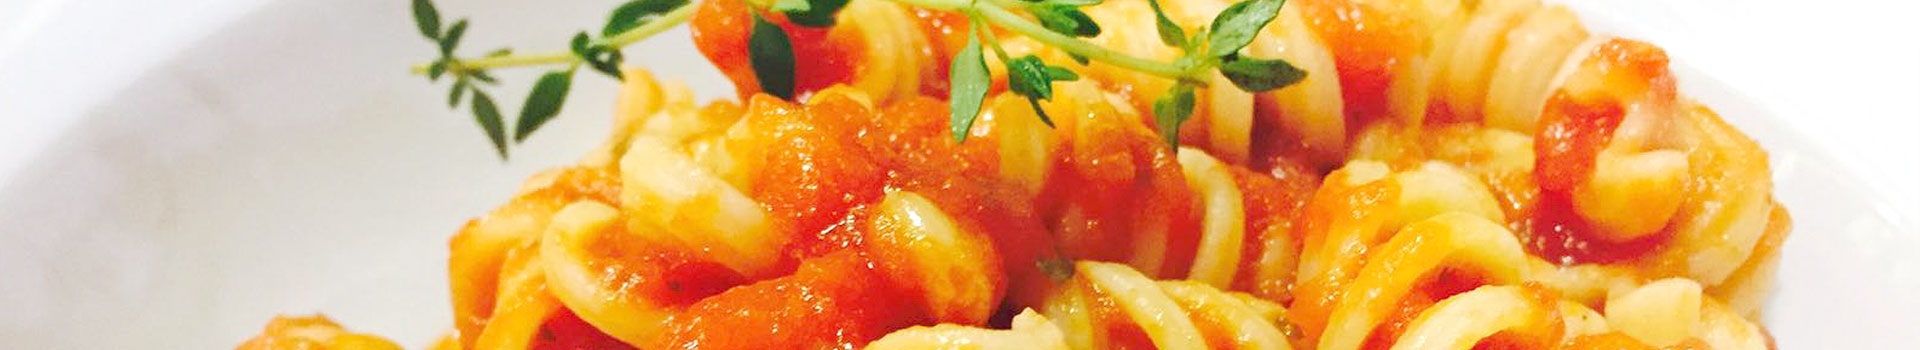 pastas-fondo-restaurante-navarro-cocina-mediterranea-centro-valencia